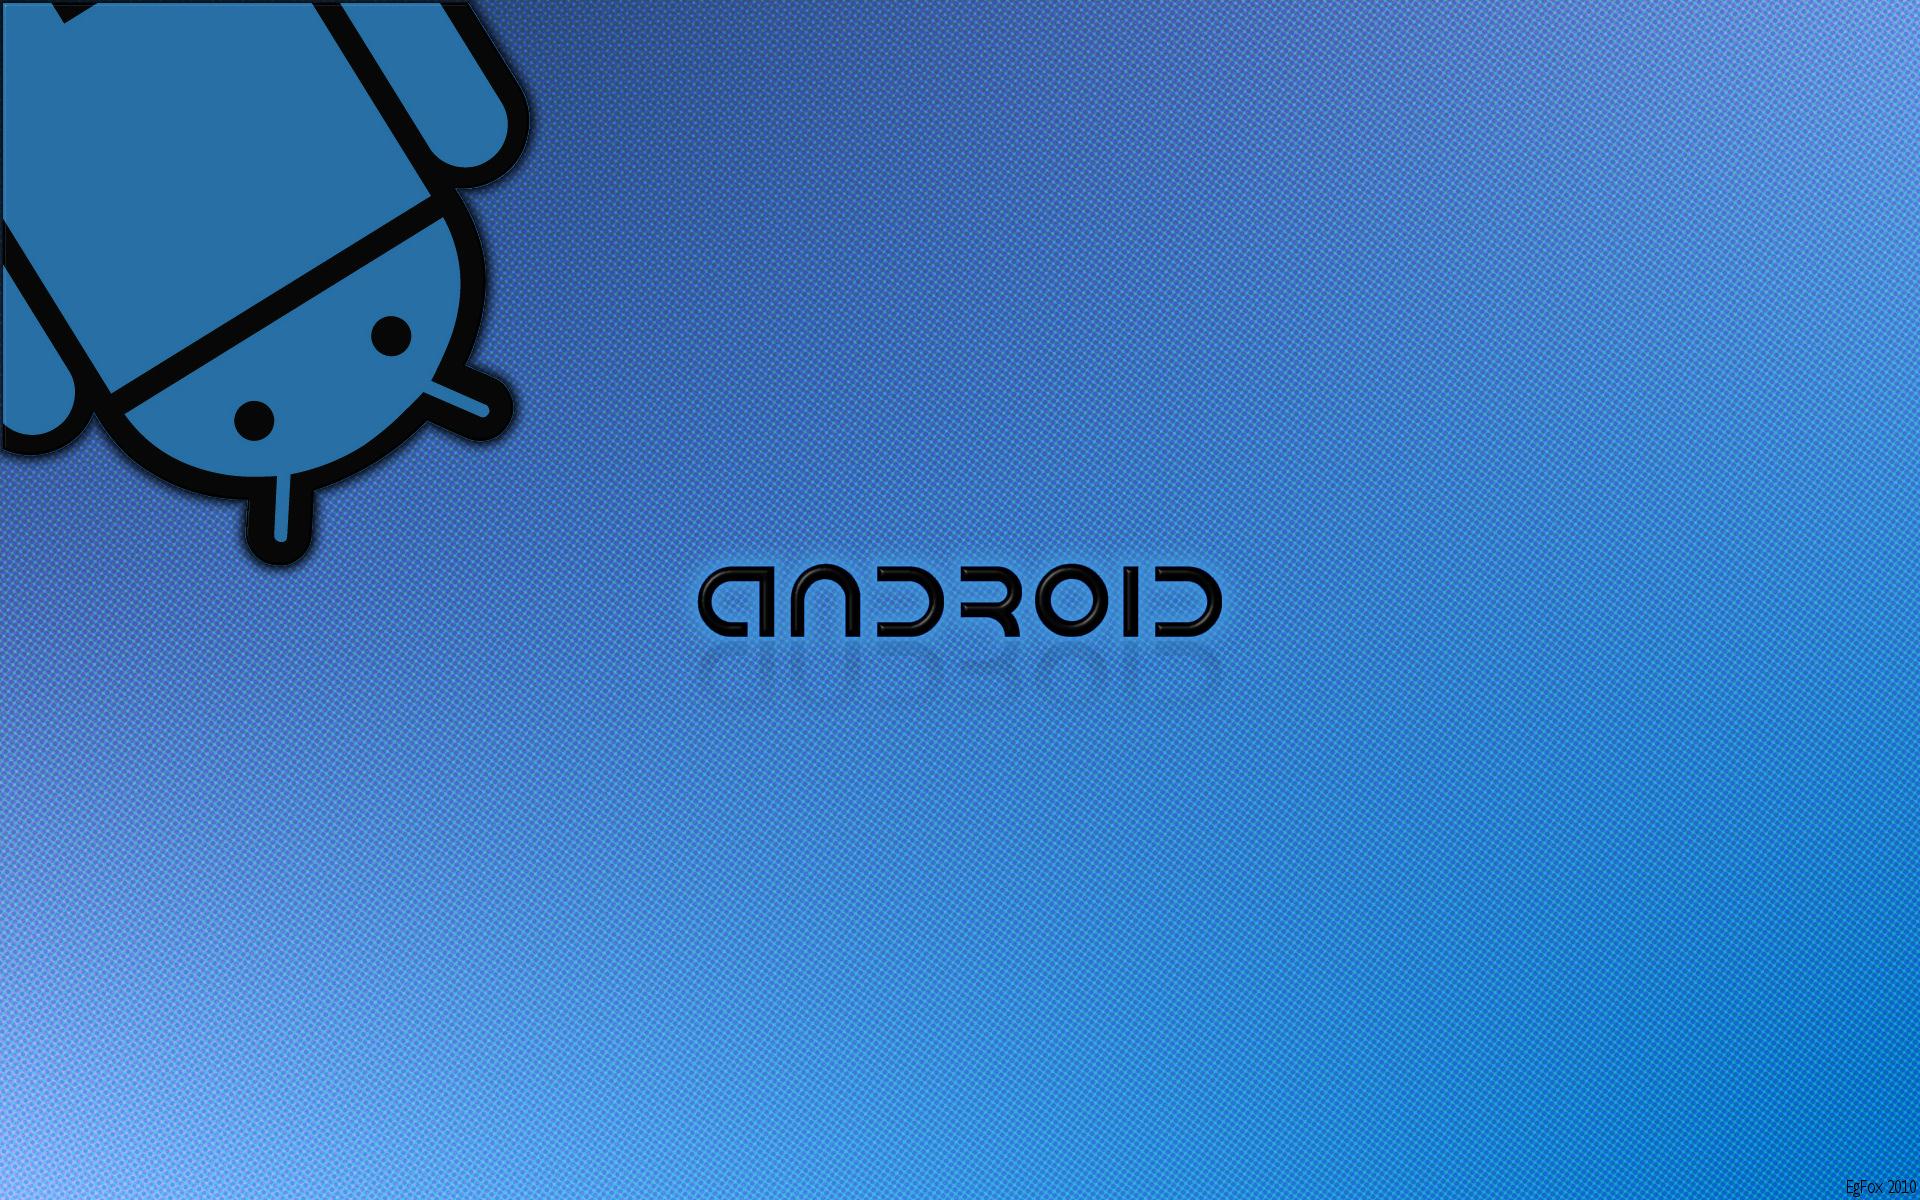 EgFox Android Look HD 2010 by Eg Art Mükemmel HD Resimler